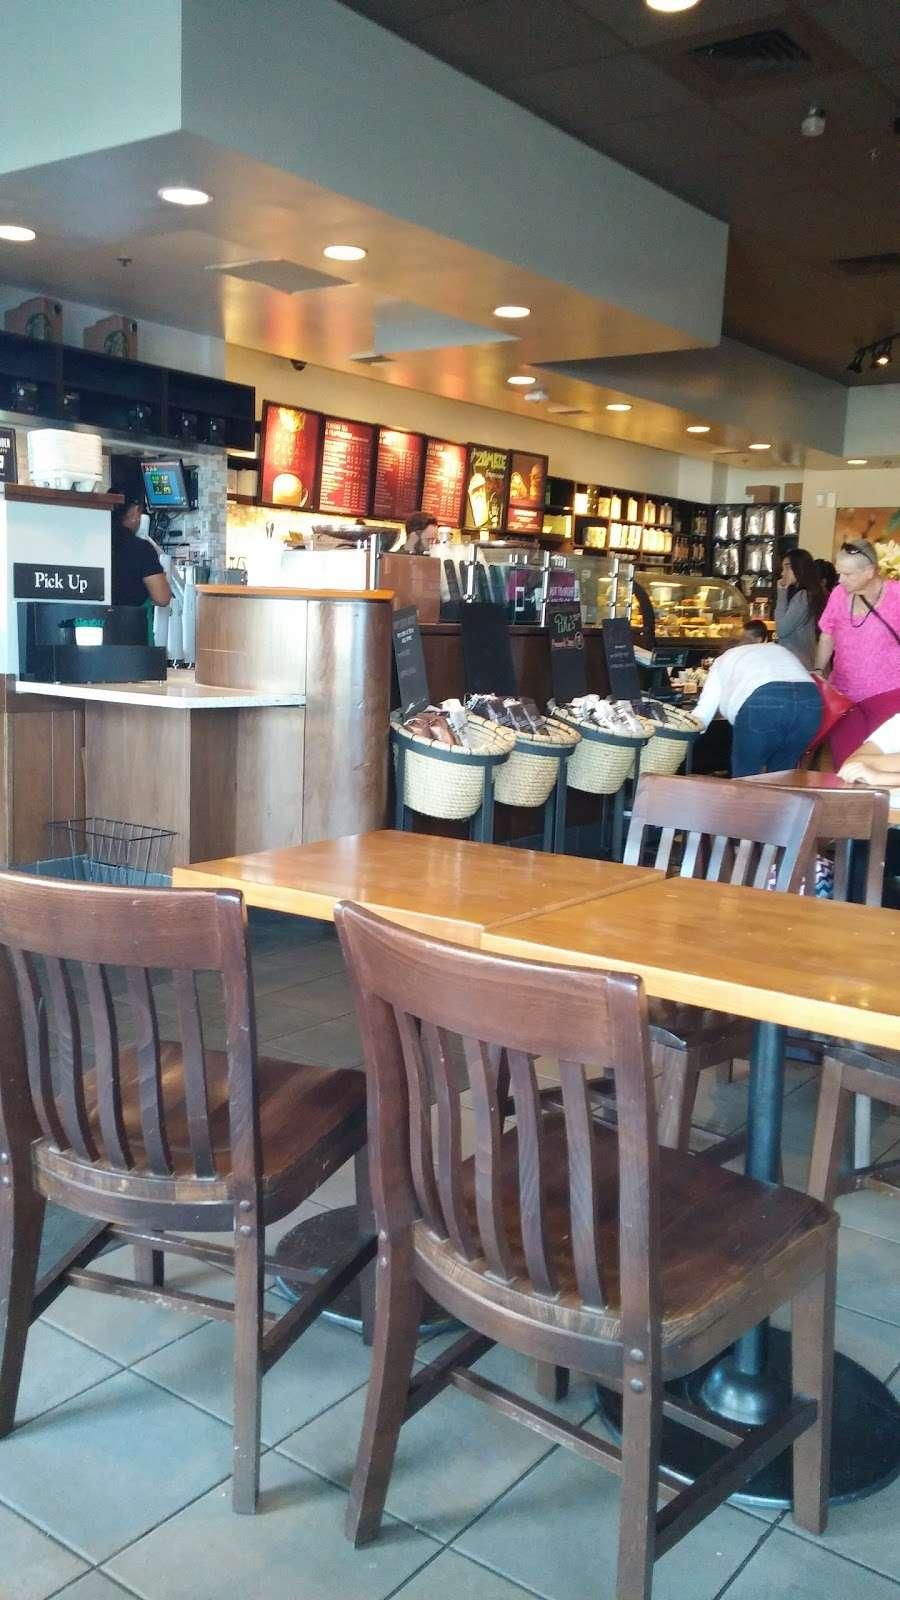 Starbucks - cafe  | Photo 8 of 10 | Address: 4045 Lone Tree Way G, Antioch, CA 94531, USA | Phone: (925) 778-2974